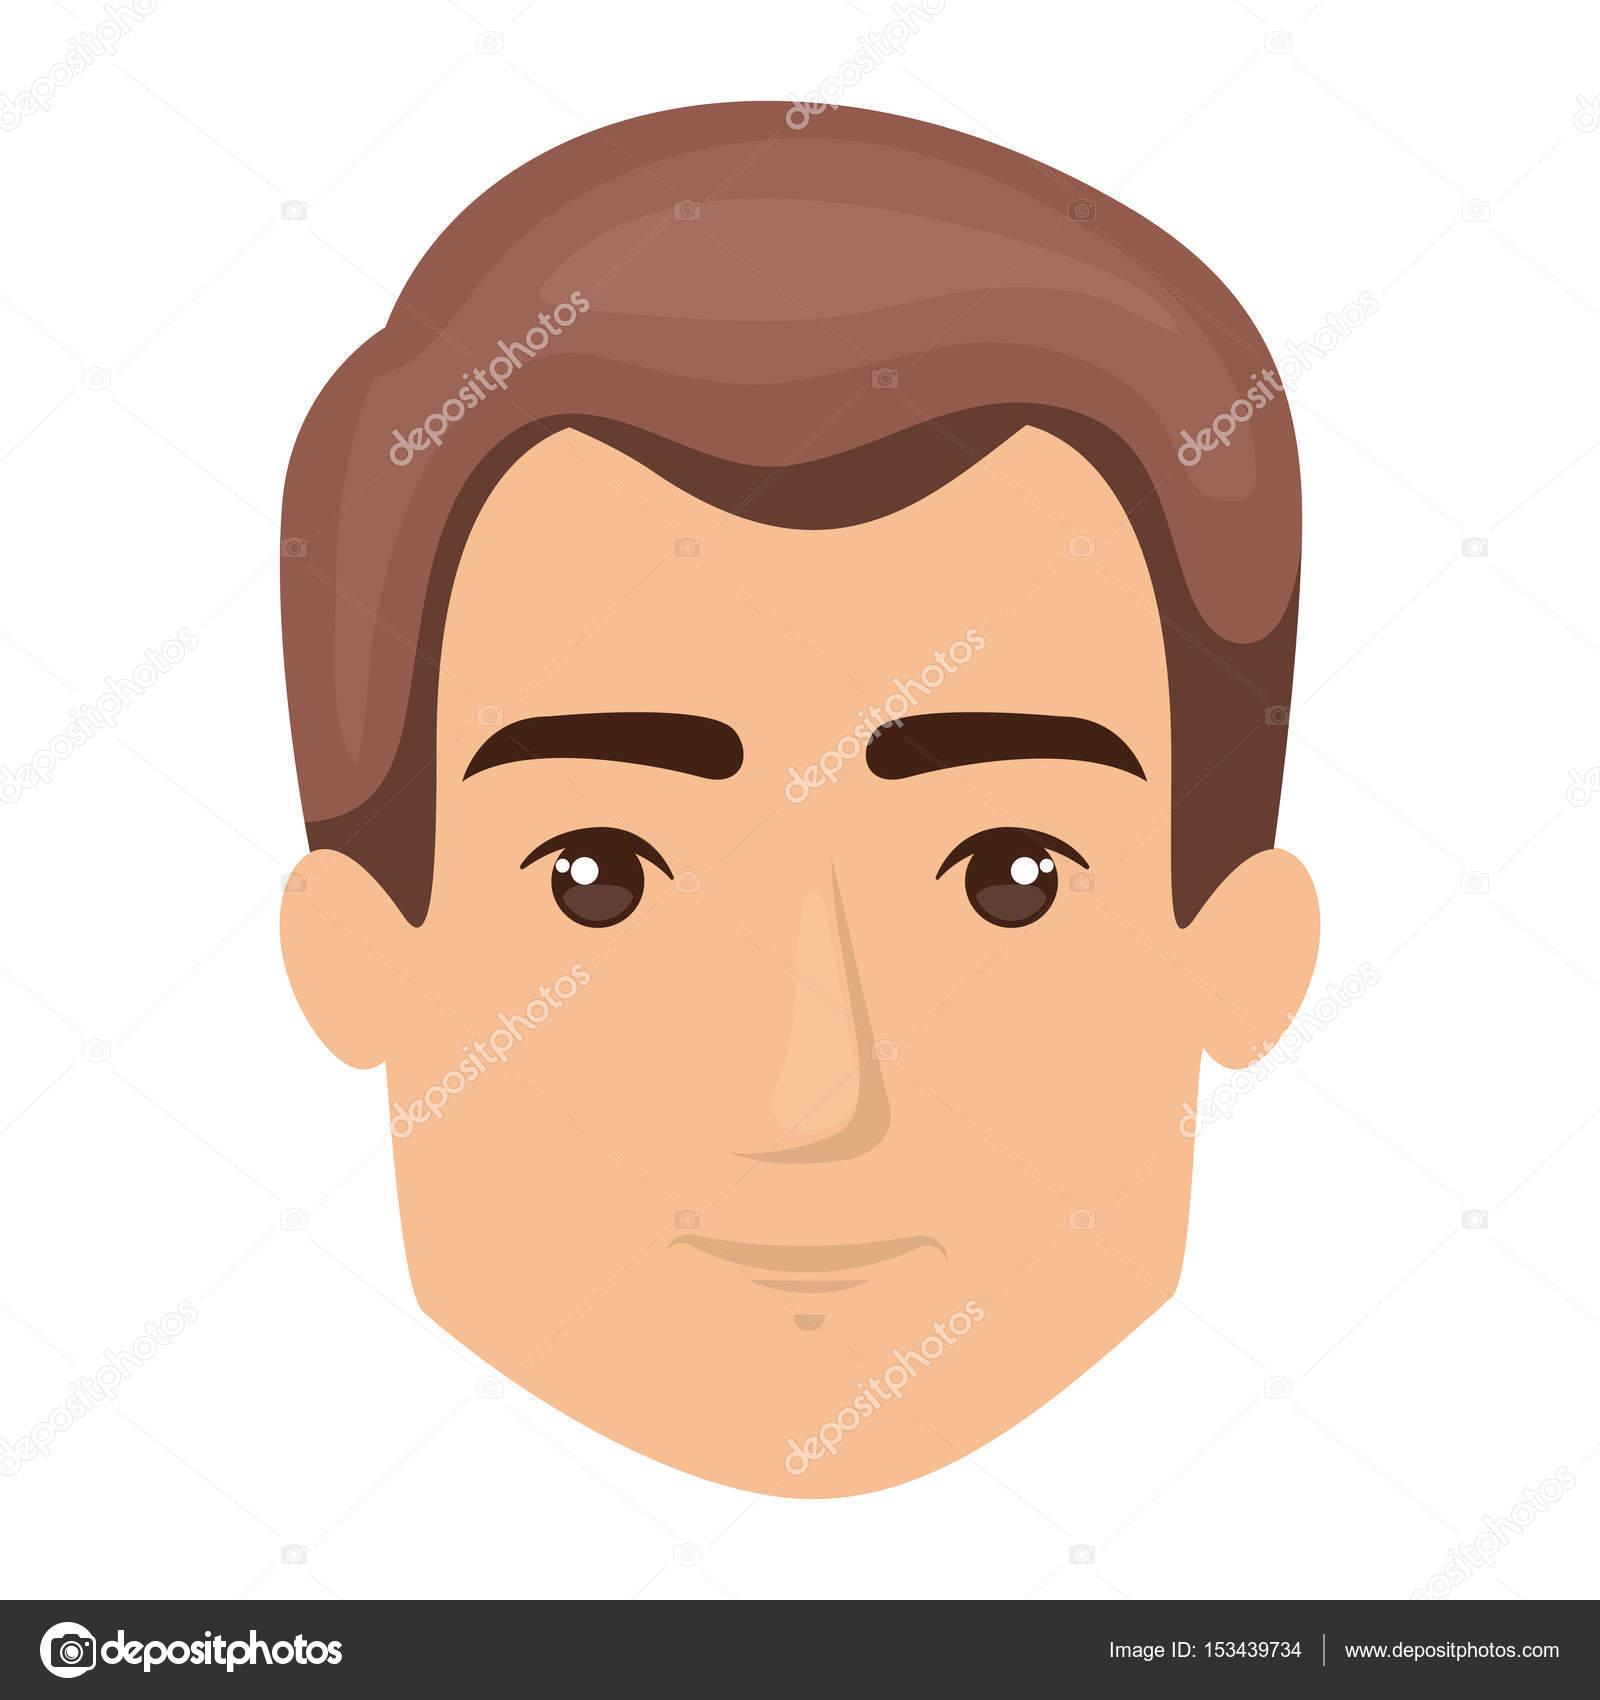 Fondo blanco de la cara de hombre con estilo de pelo corto castaño claro —  Archivo b99e9f51780